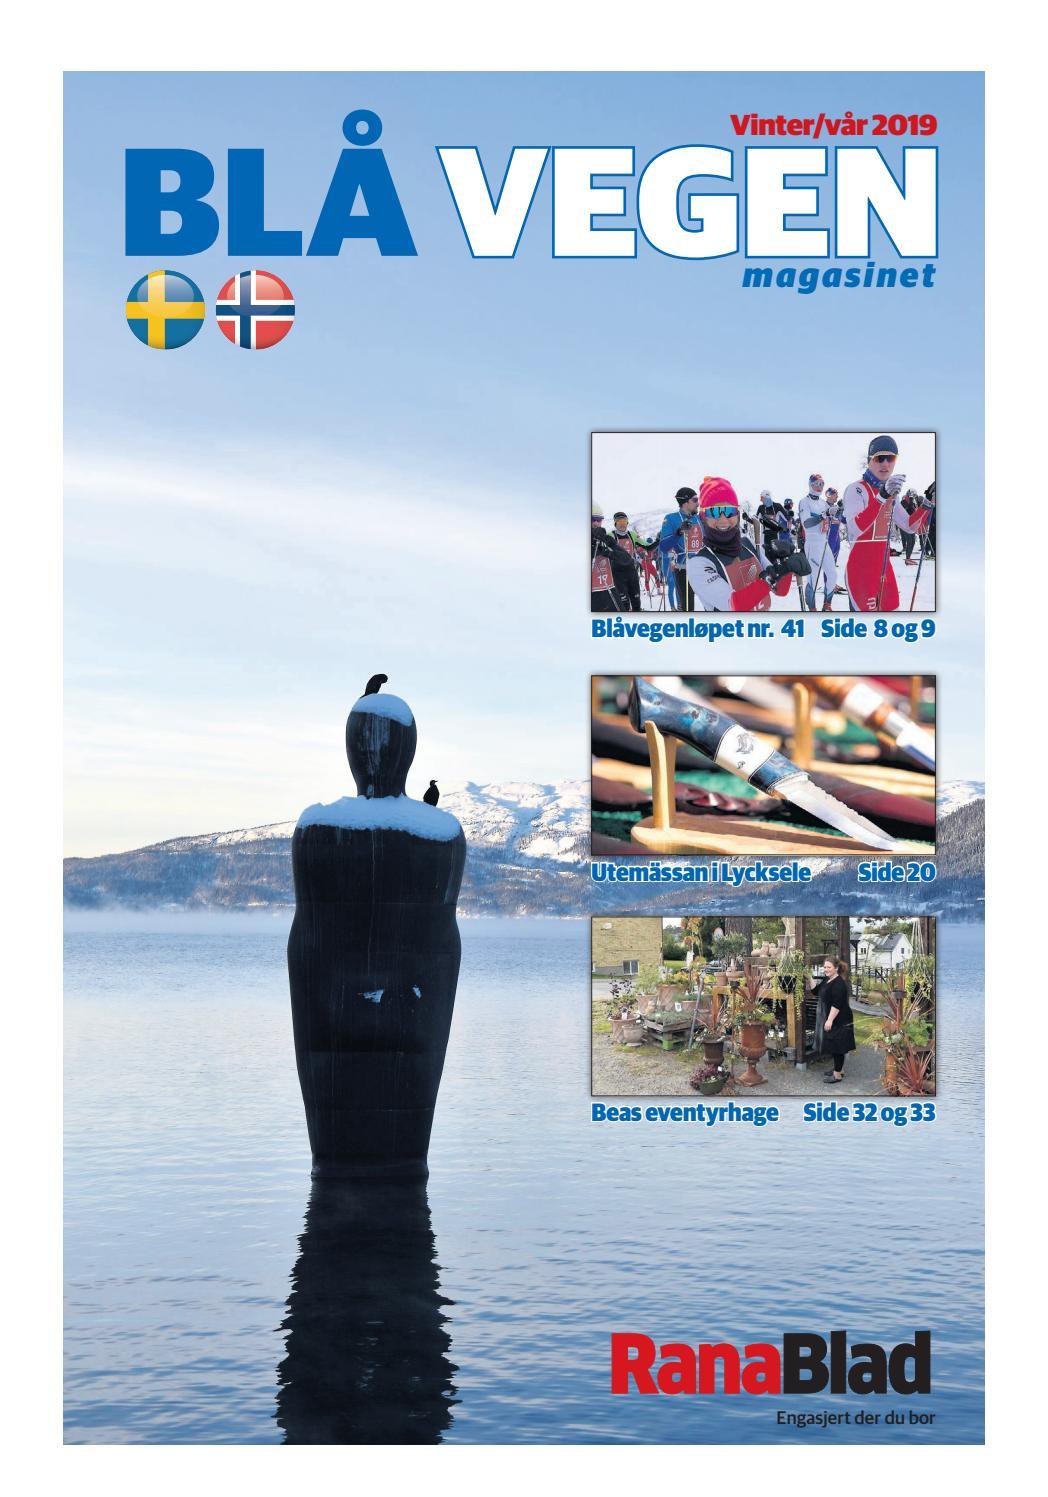 faba6ce2 Blå Vegen magasinet vinter/vår 2019 by Rana Blad - issuu